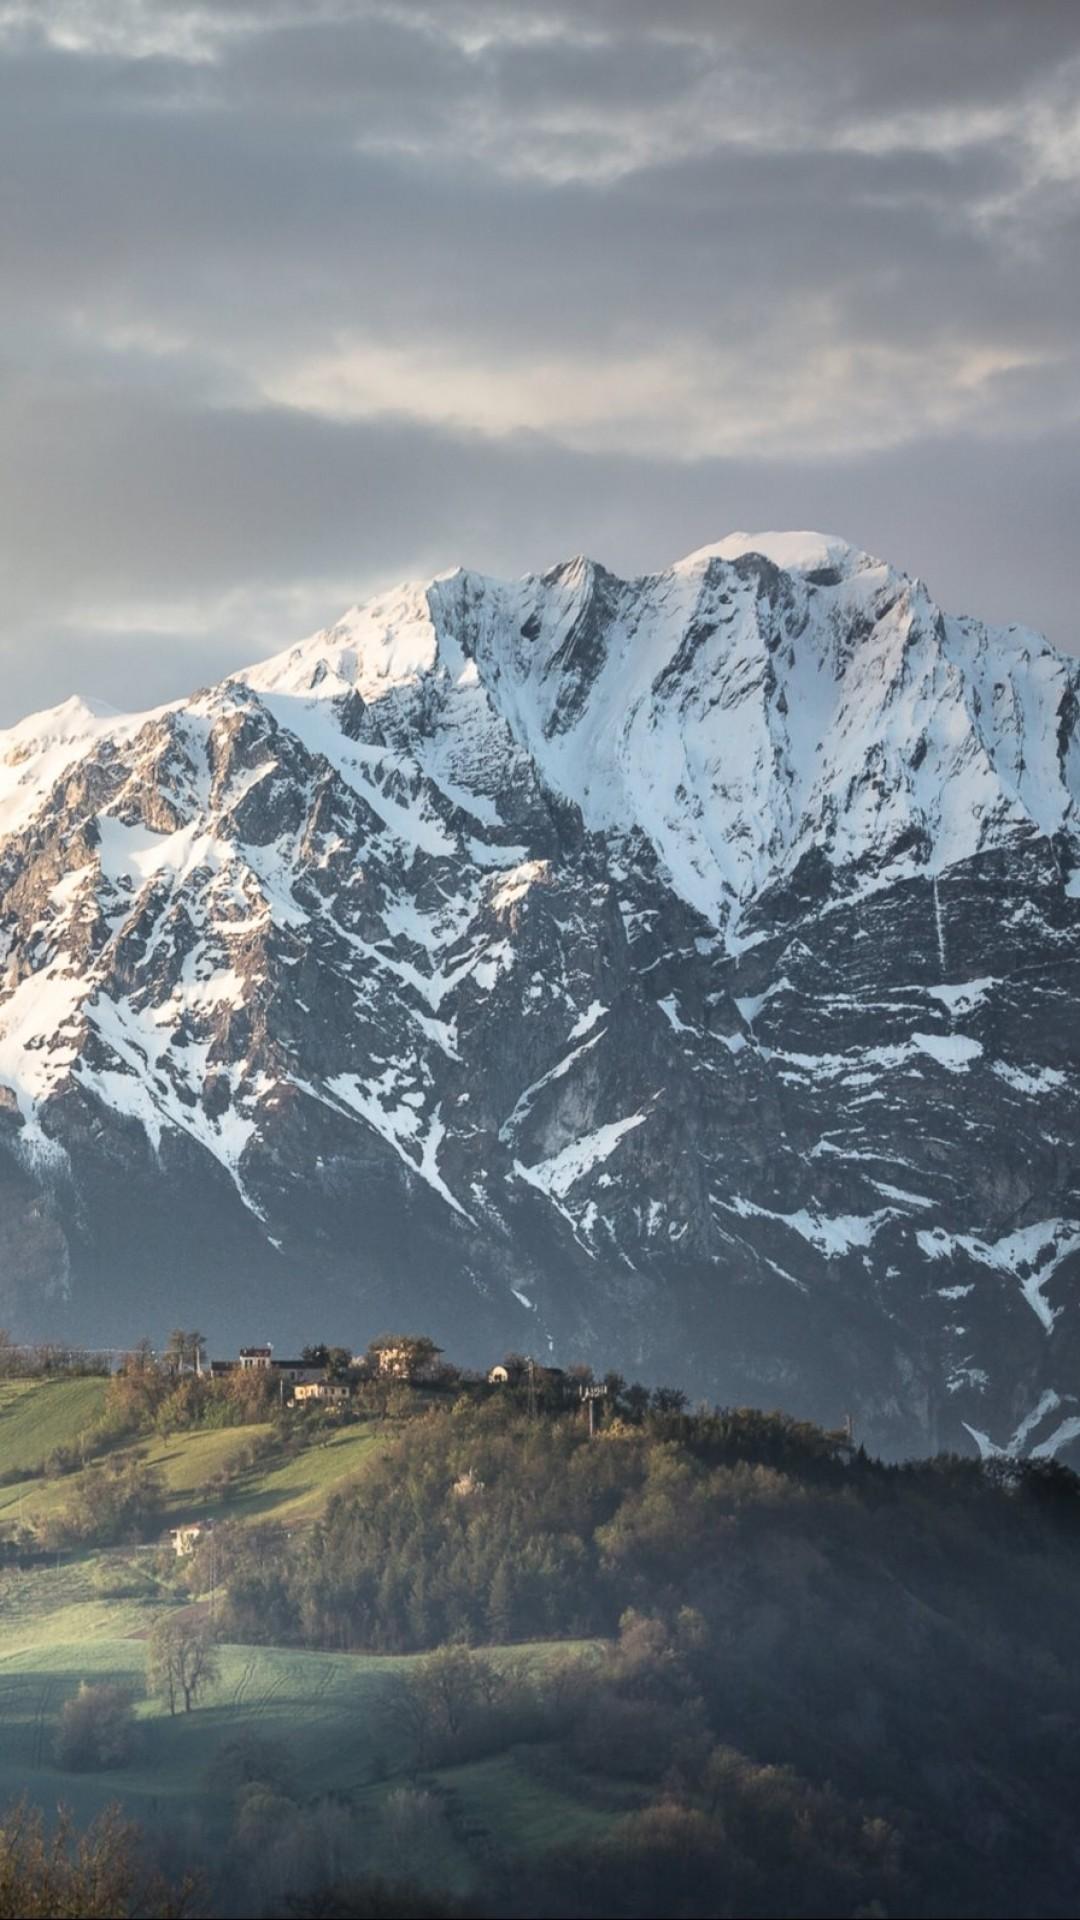 Image Result For Mount Everest Wallpaper Best Of Everest Wallpapers Hd Download